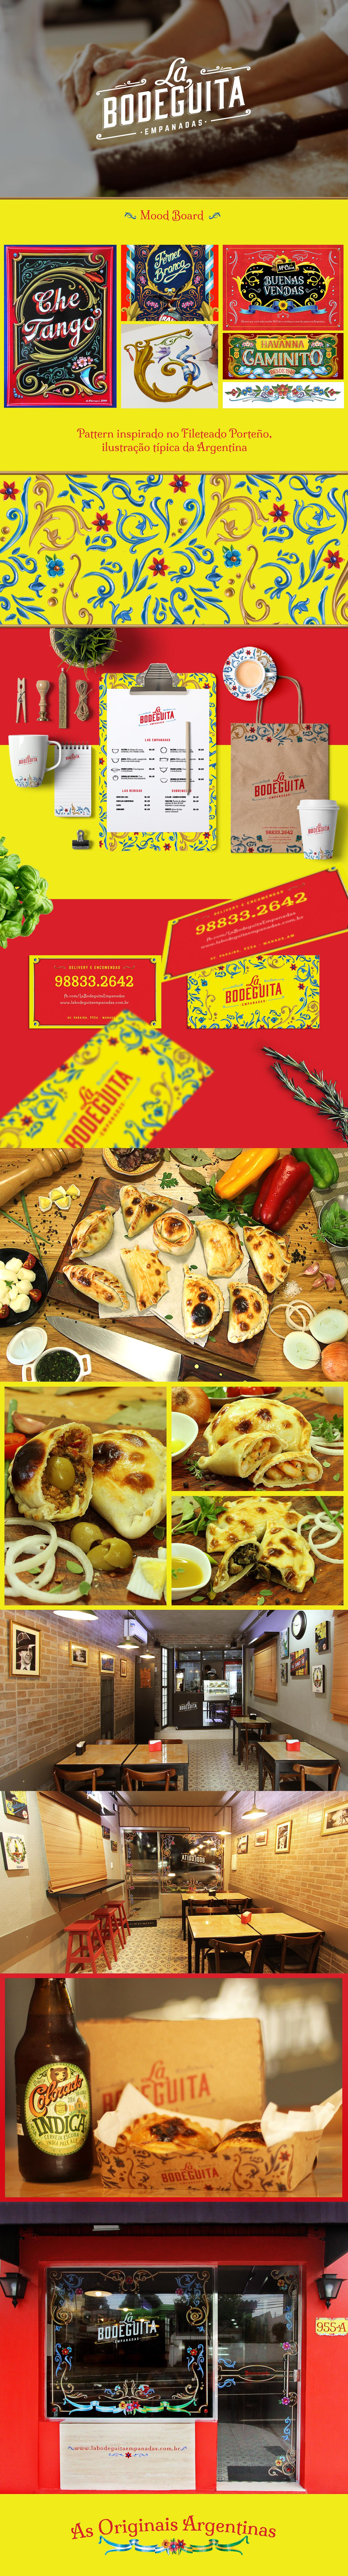 restaurant,Food ,empanada,argentina,comida,restaurante